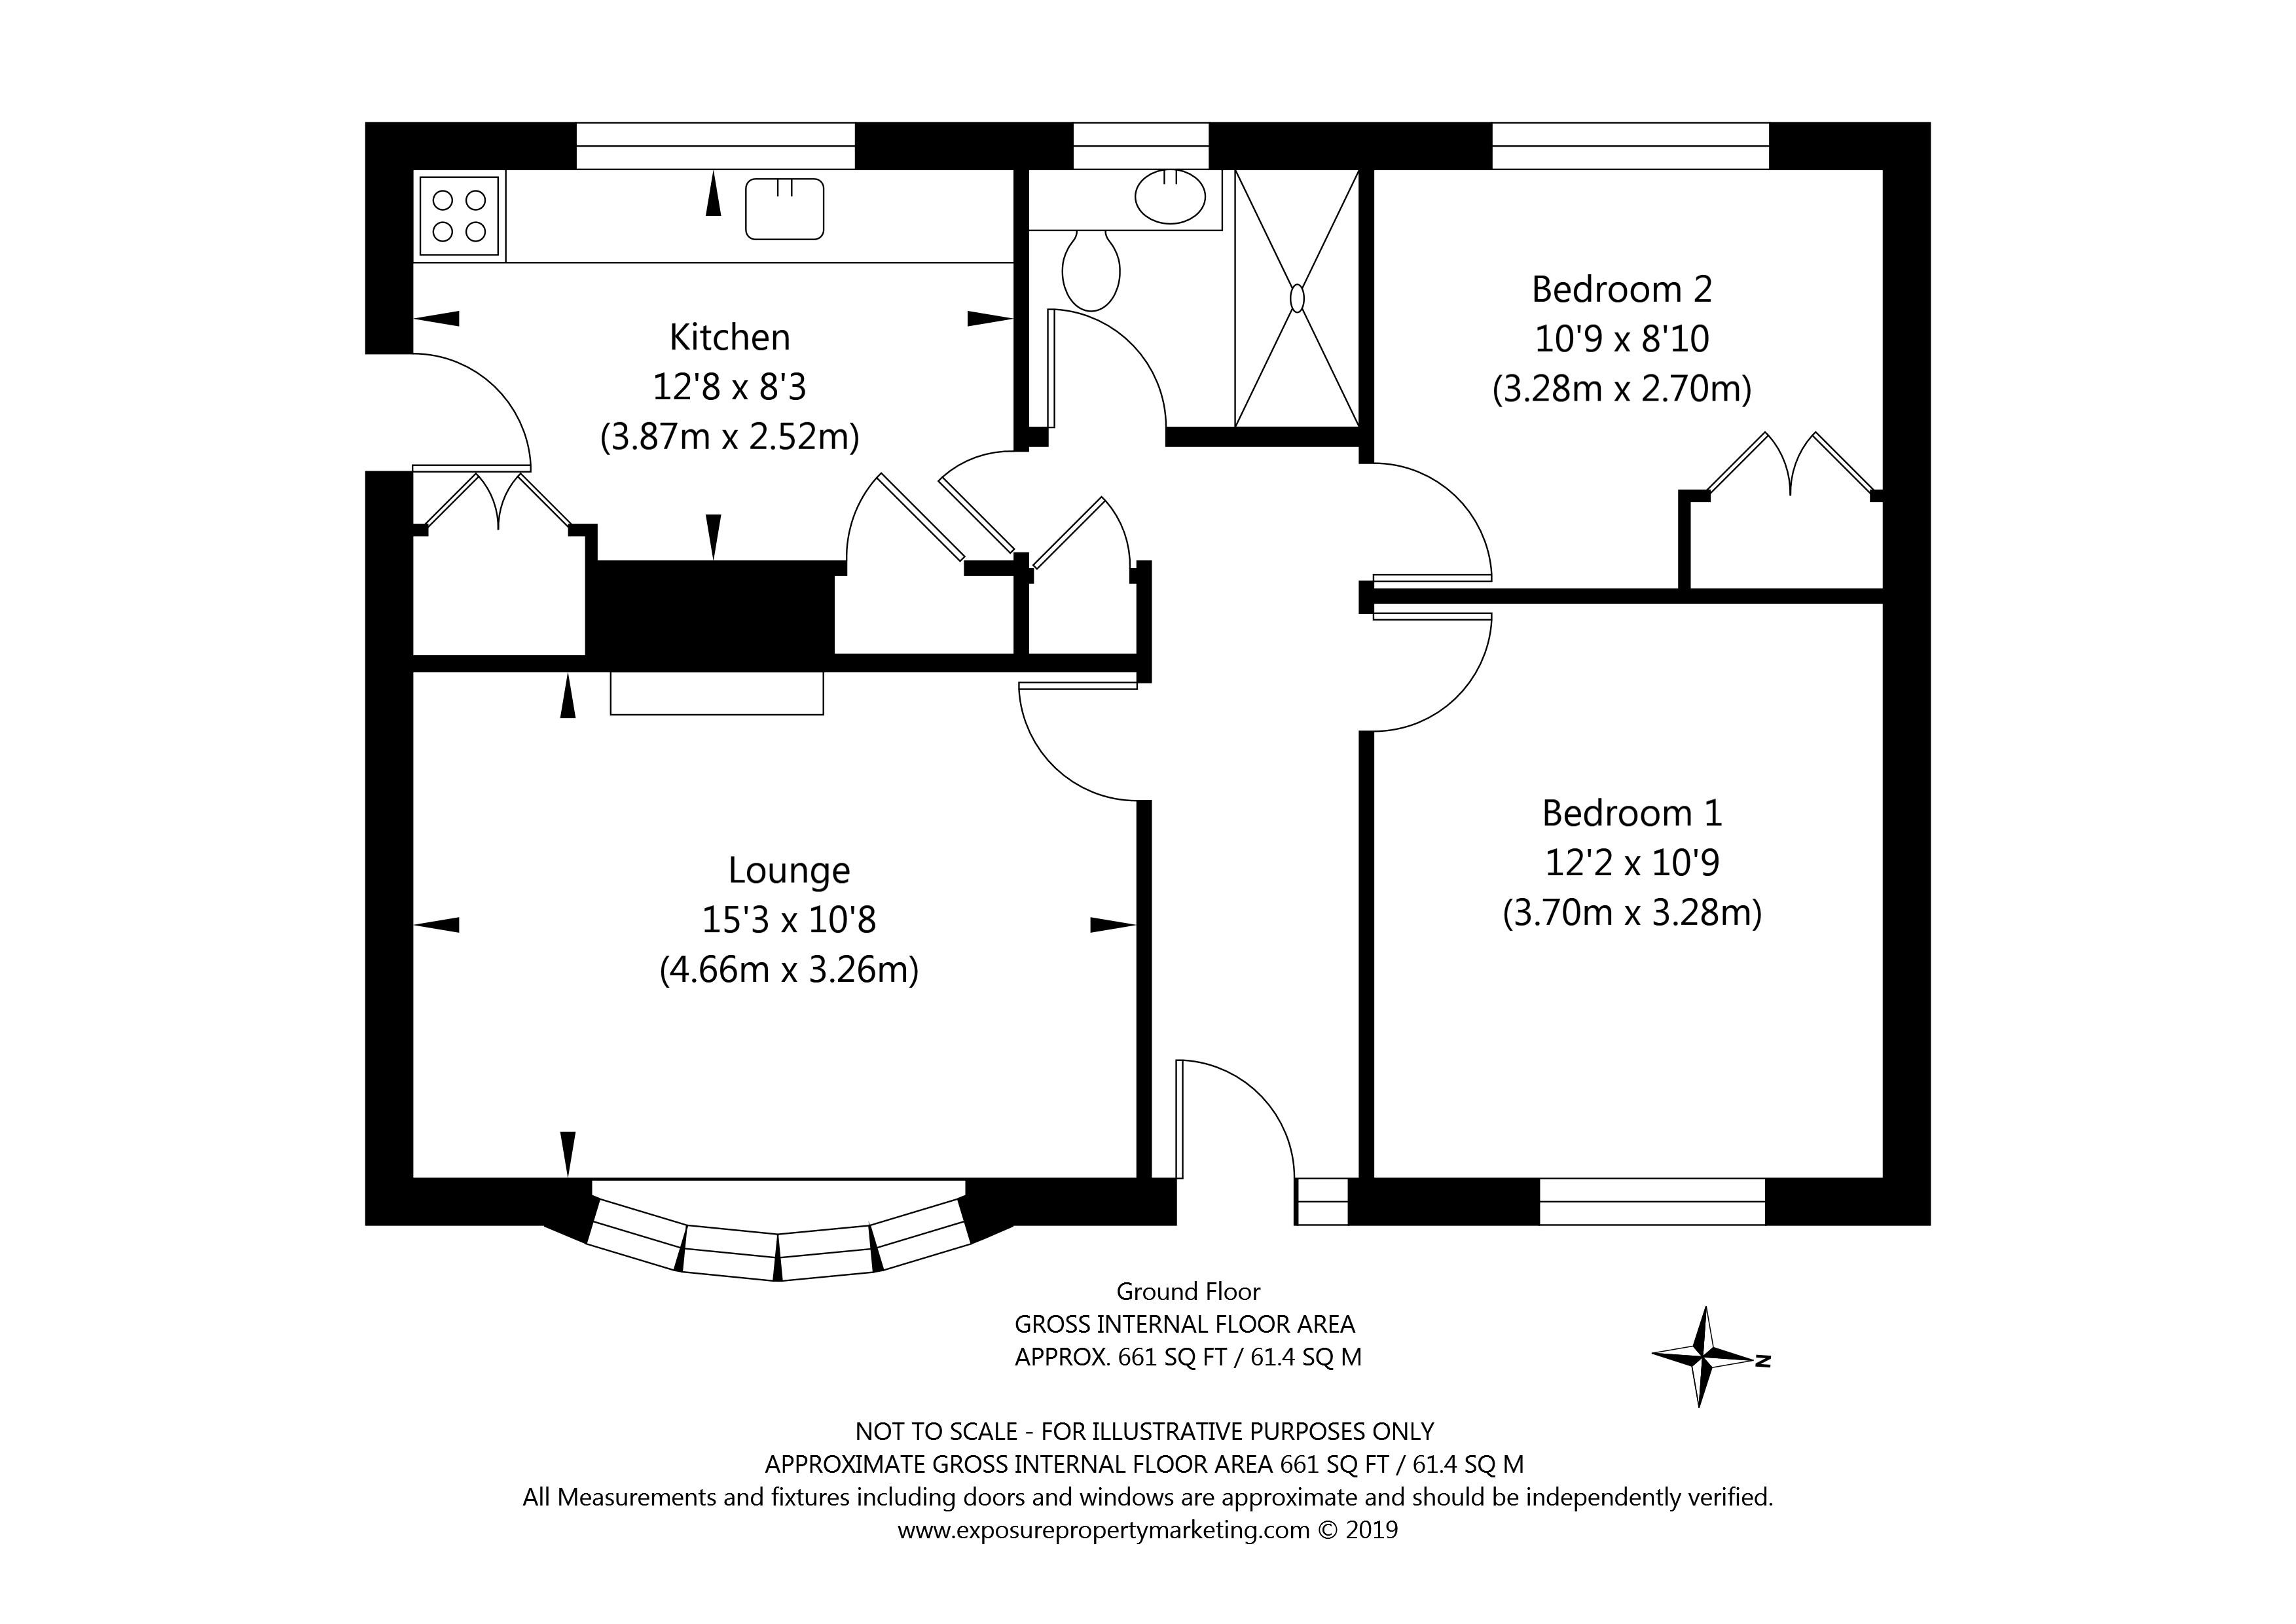 60 New Lane, Huntington, York property floorplan